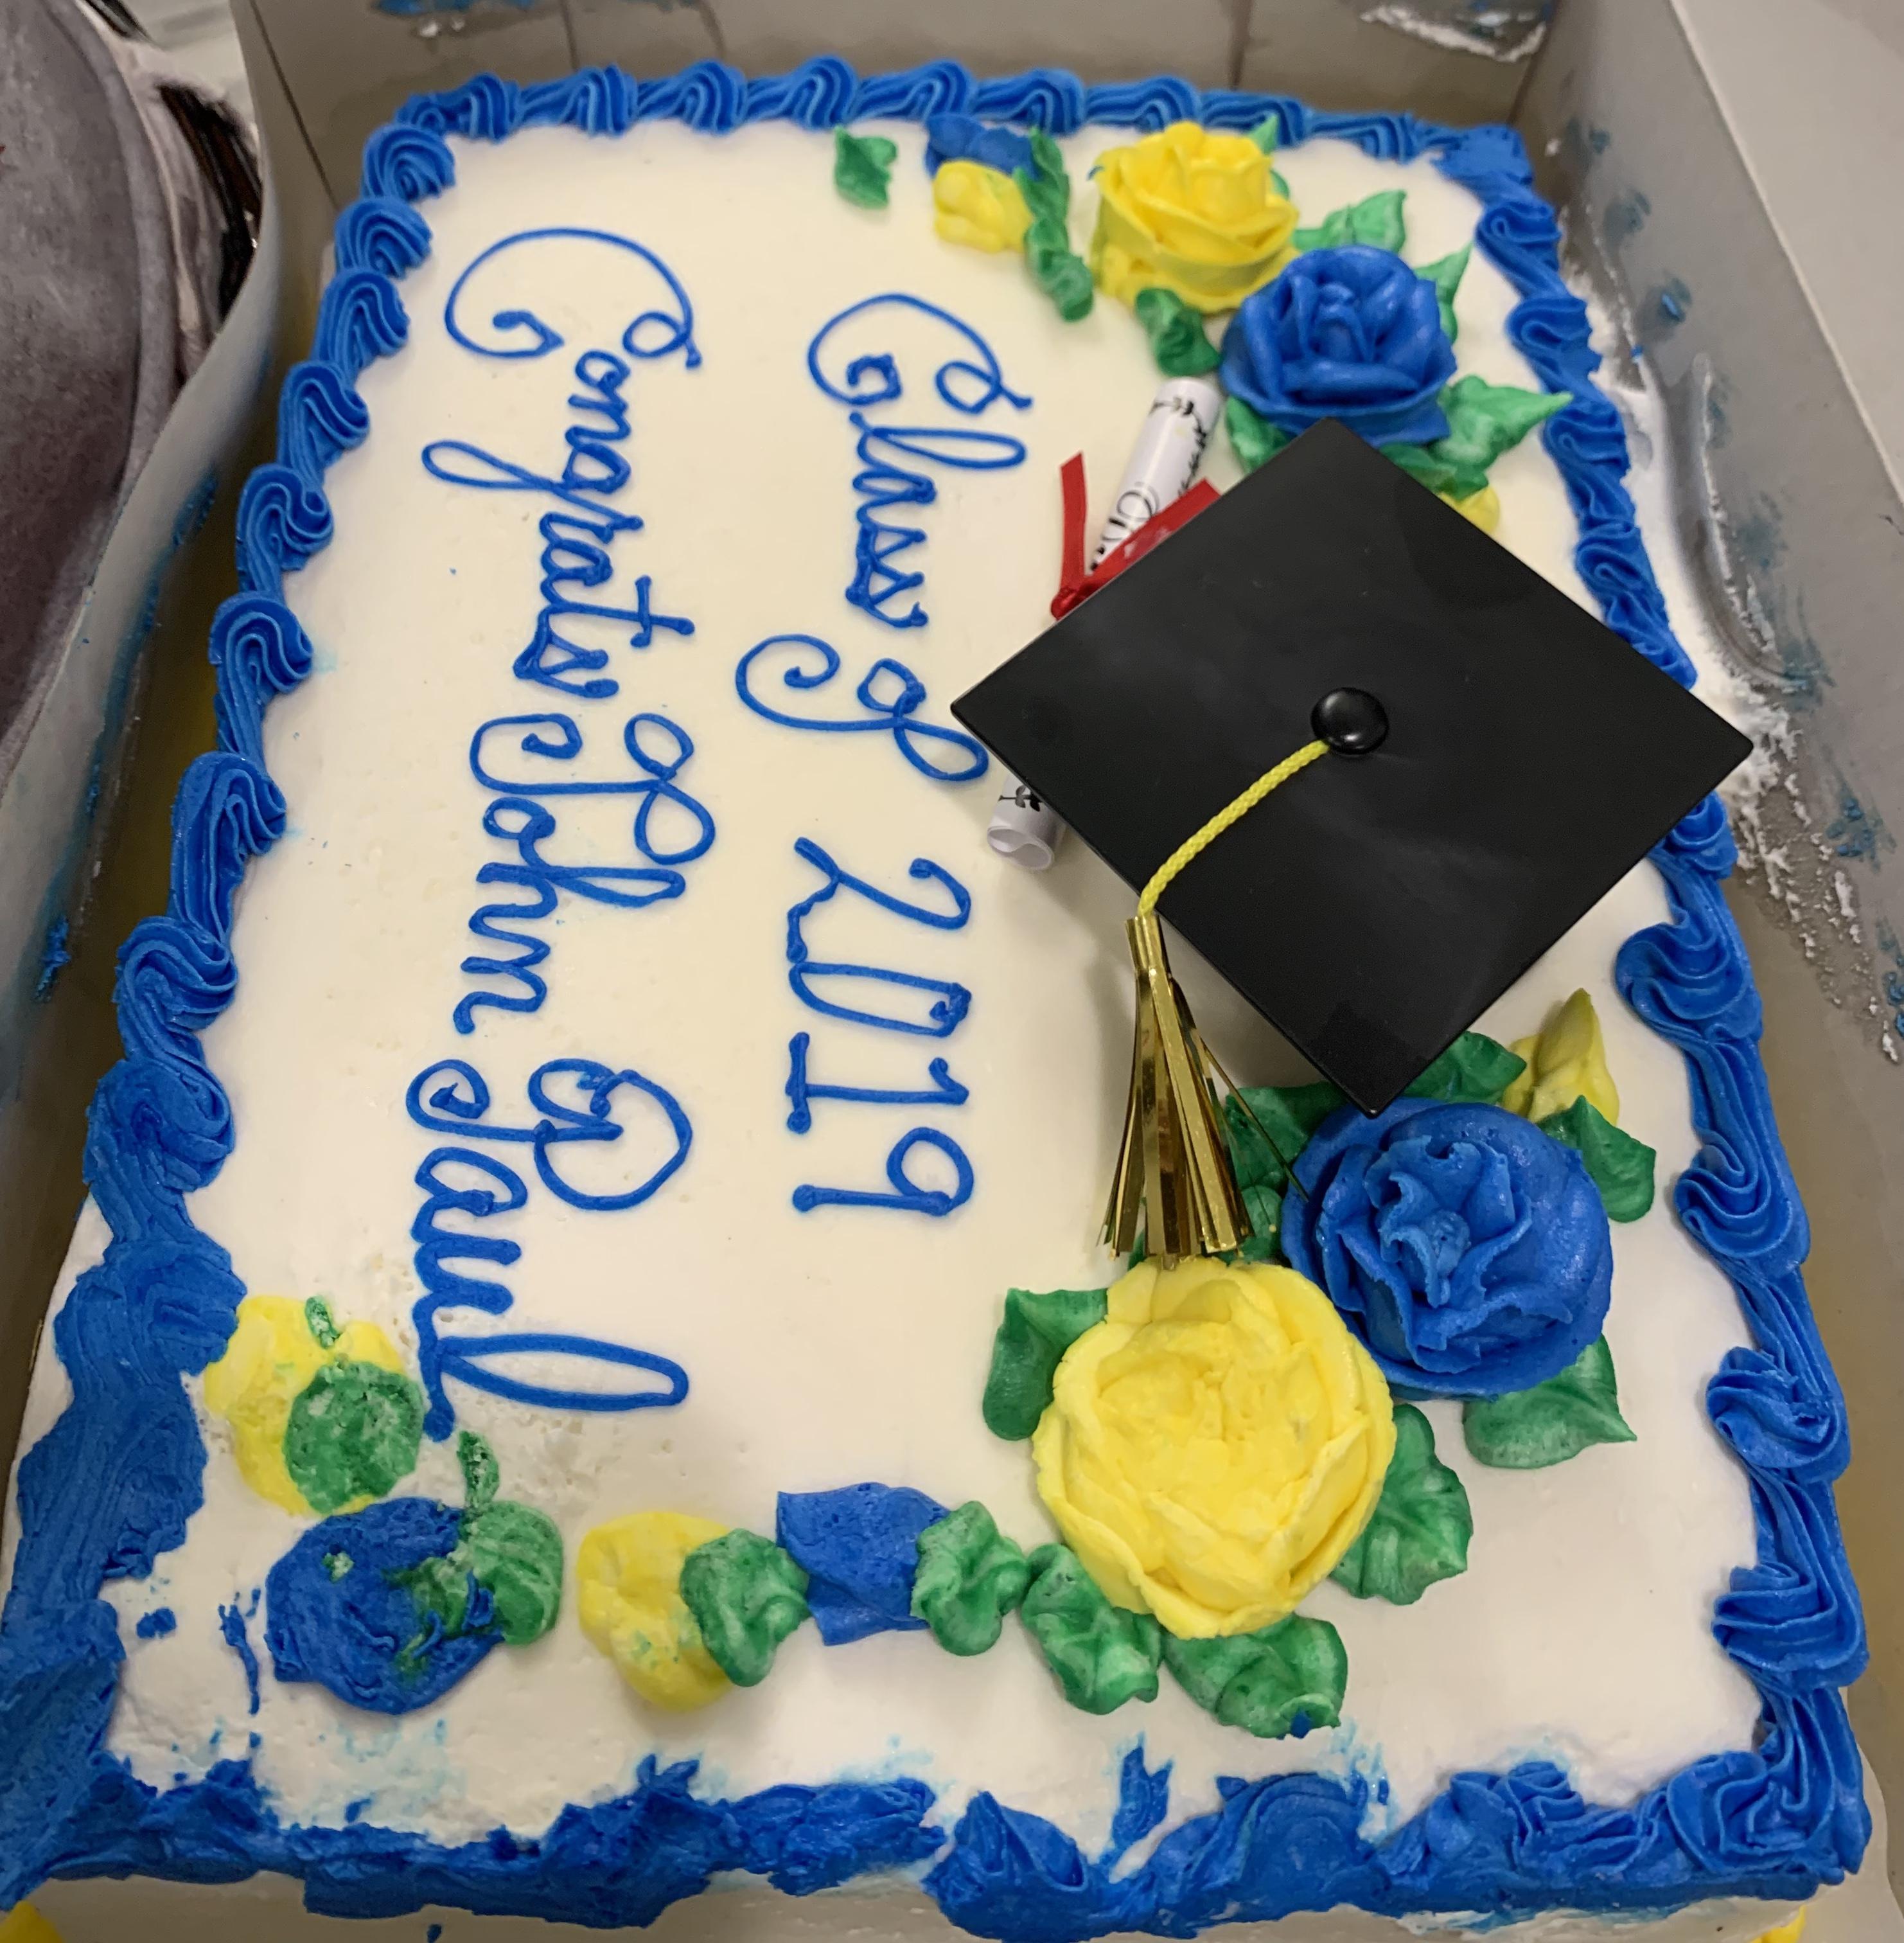 https://0201.nccdn.net/1_2/000/000/0db/c68/JP-Cake-graduacion.-2964x3024.jpg